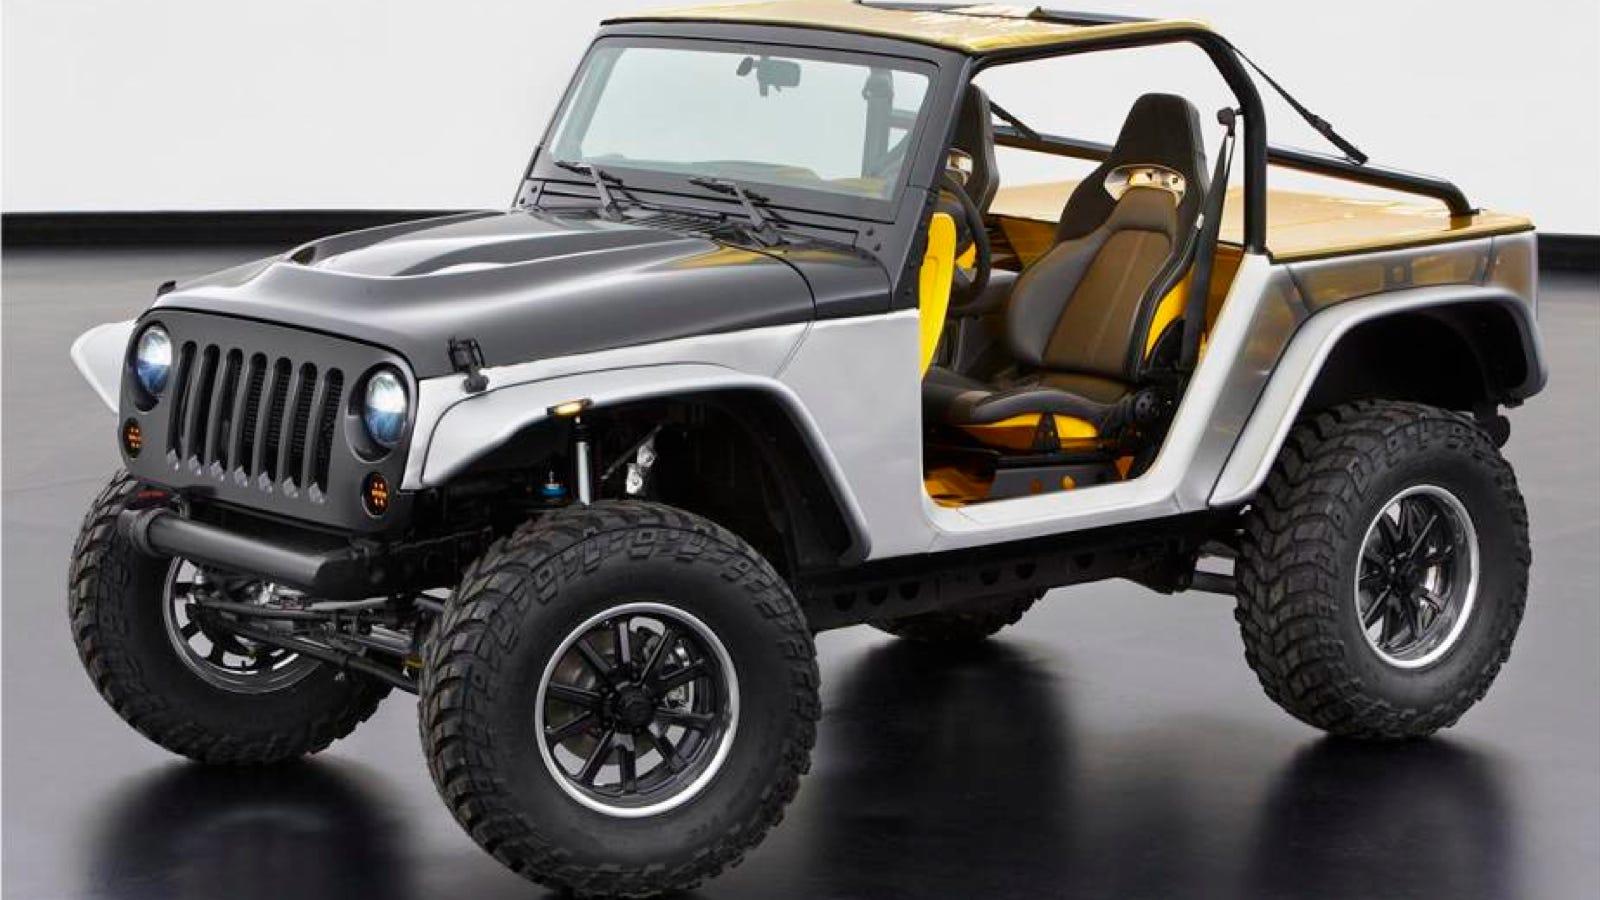 aluminum unibody for the 2017 jeep wrangler?